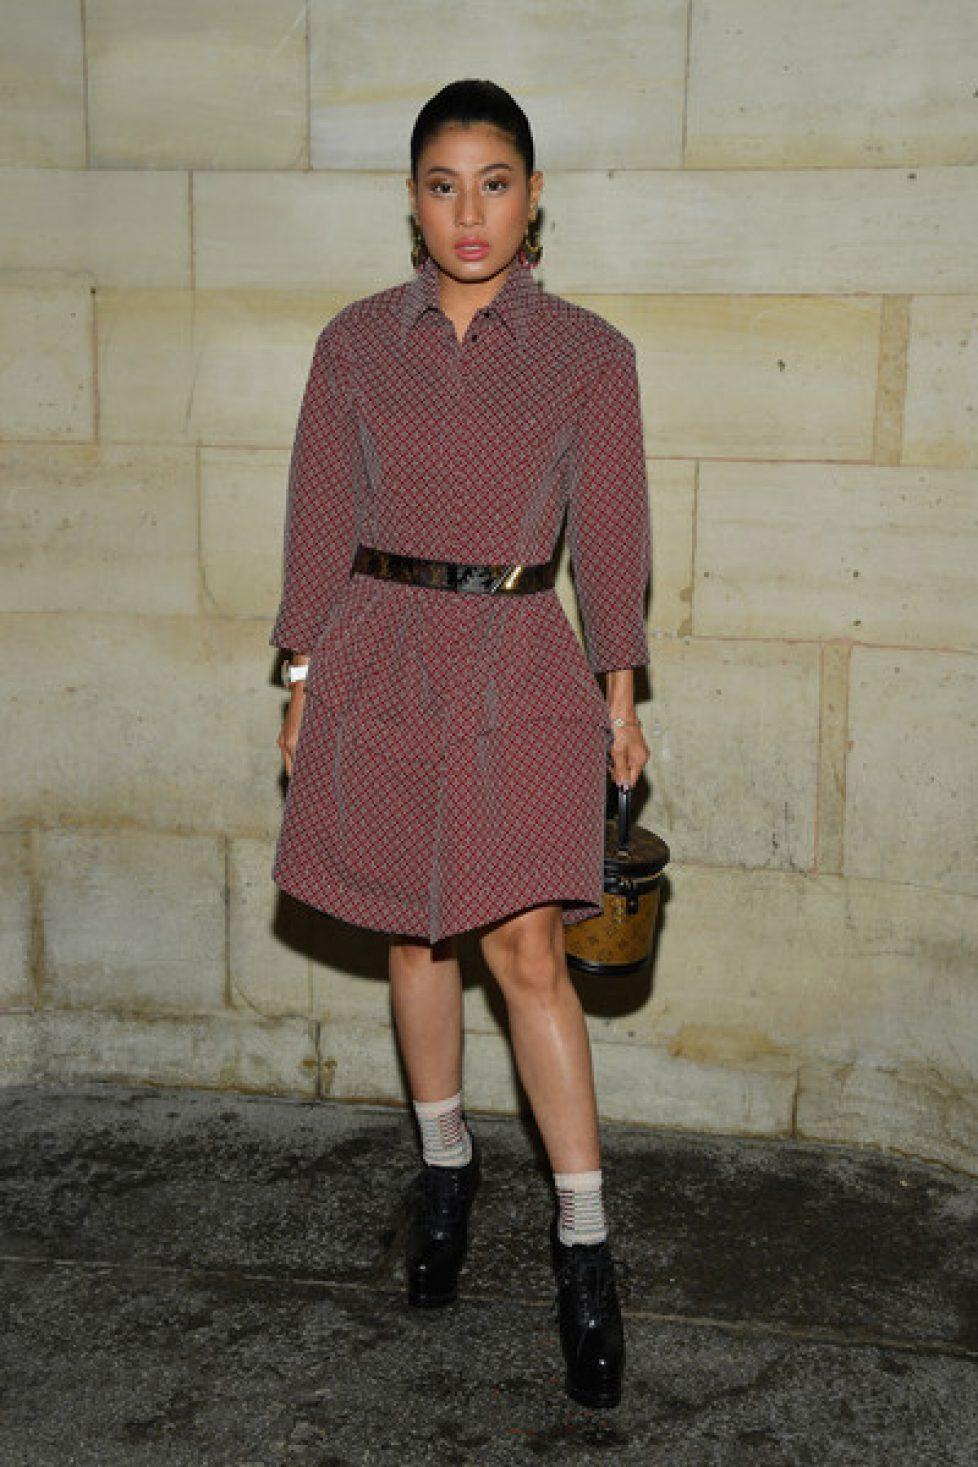 Louis+Vuitton+Front+Row+Paris+Fashion+Week+x0g7HB7u_kNl